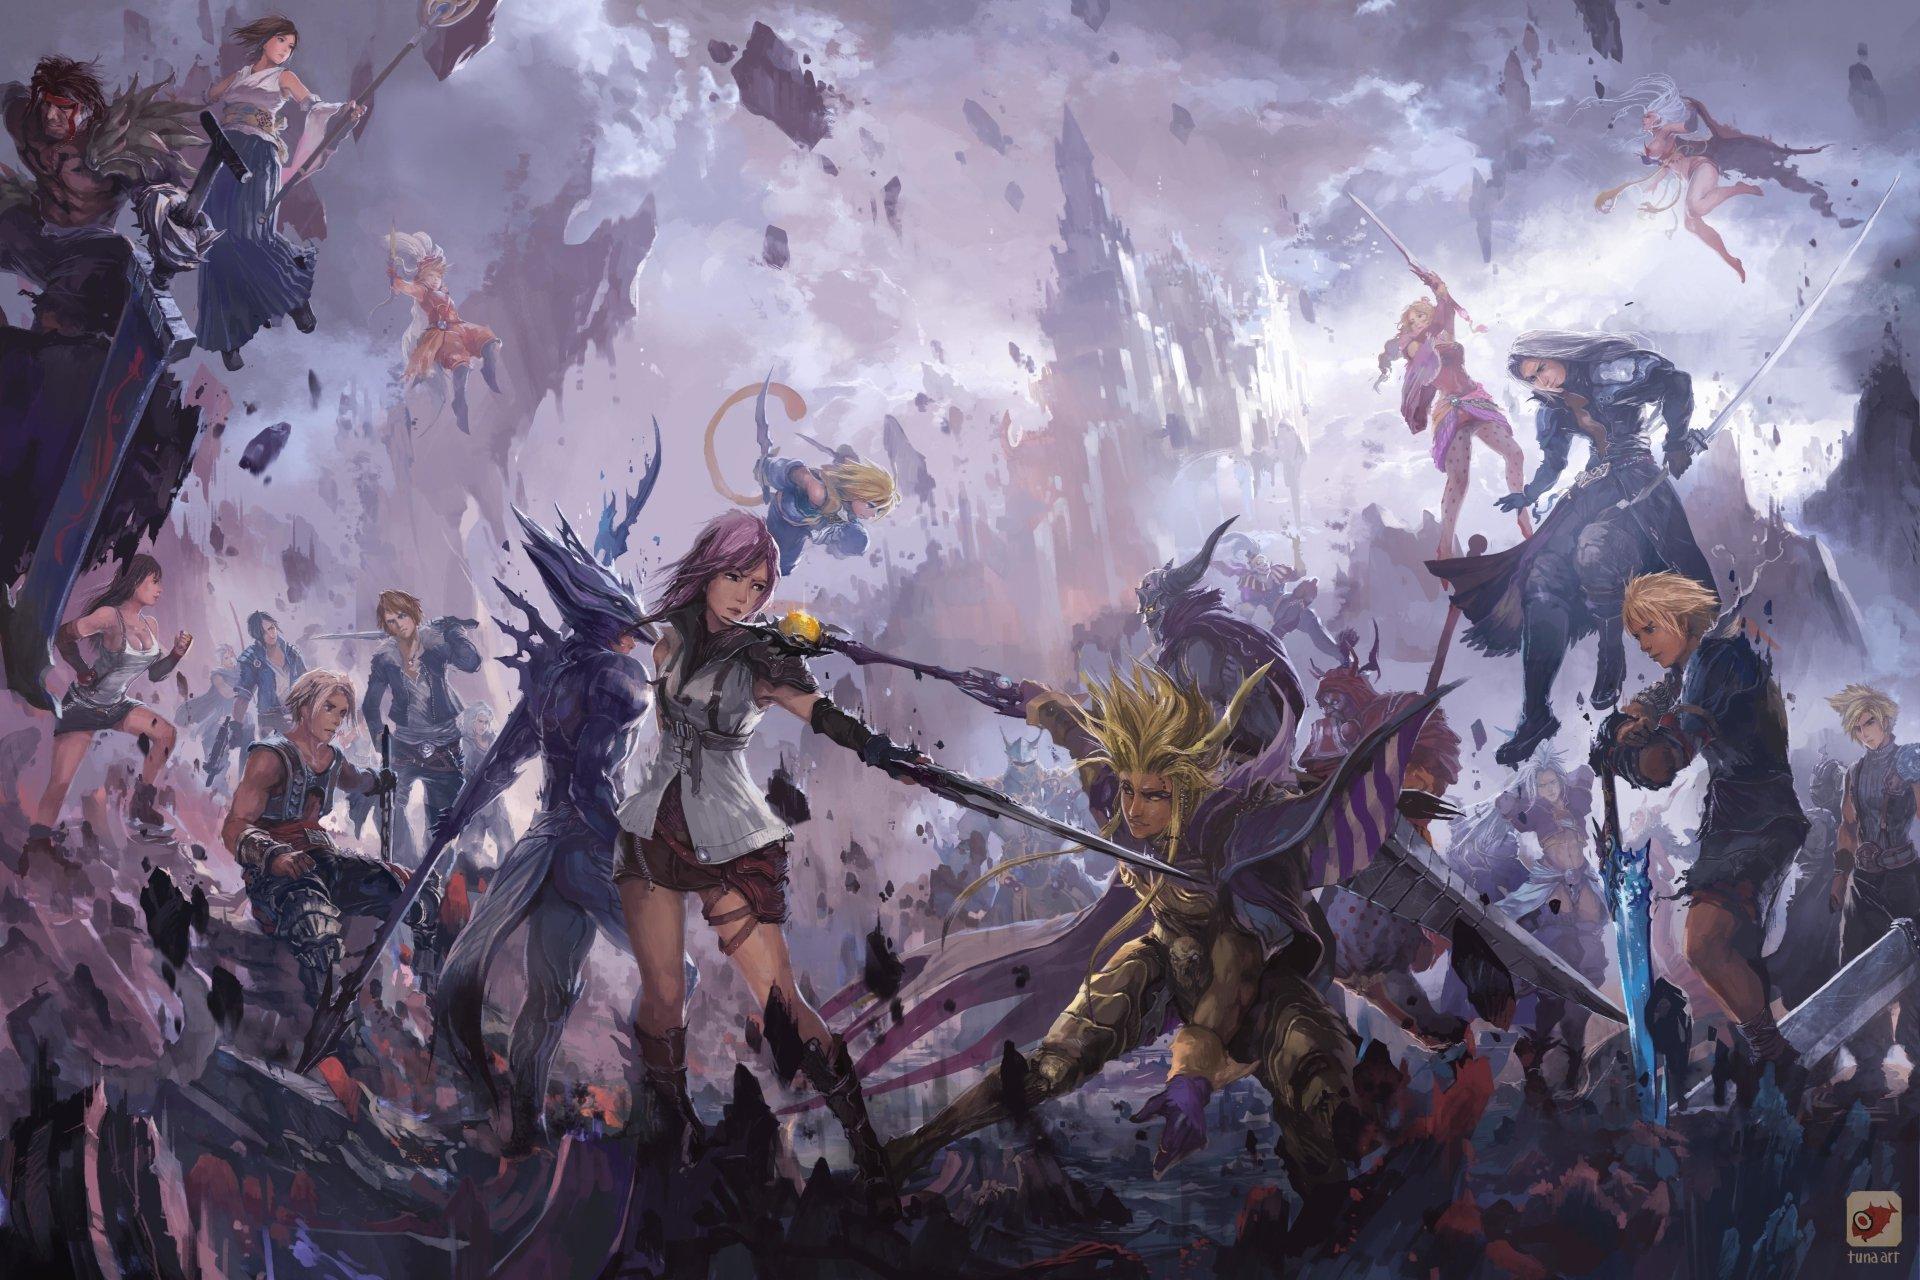 Dissidia 012 Final Fantasy 4k Ultra HD Wallpaper